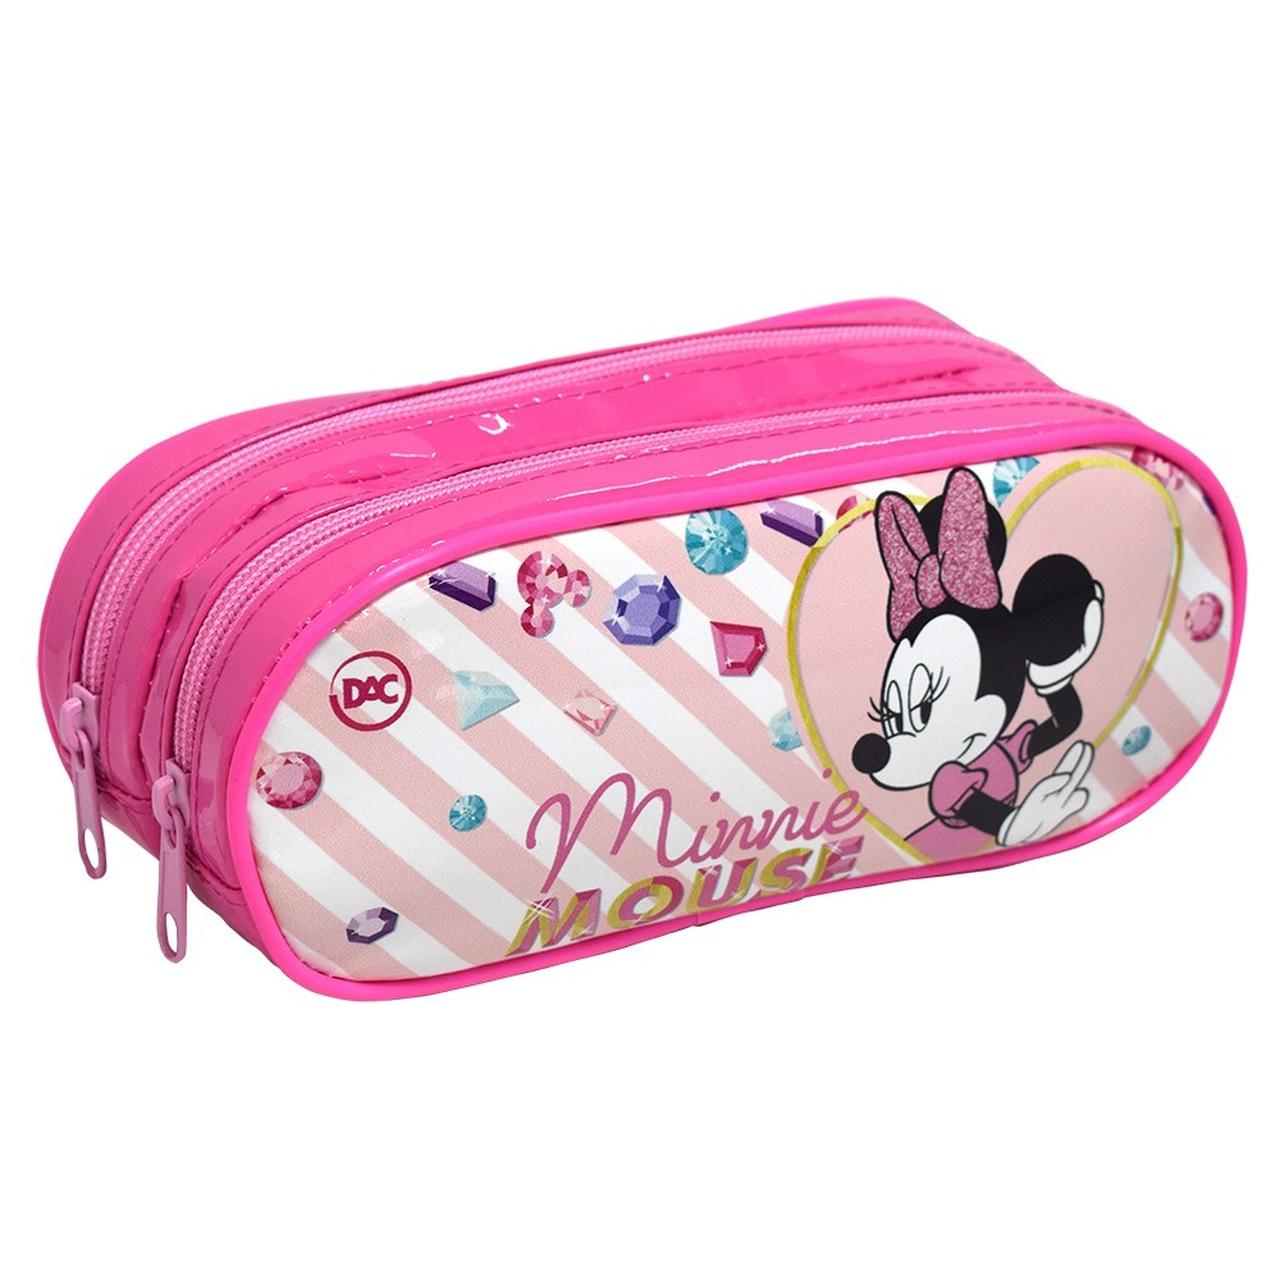 Estojo Duplo Minnie Mouse Teen DAC